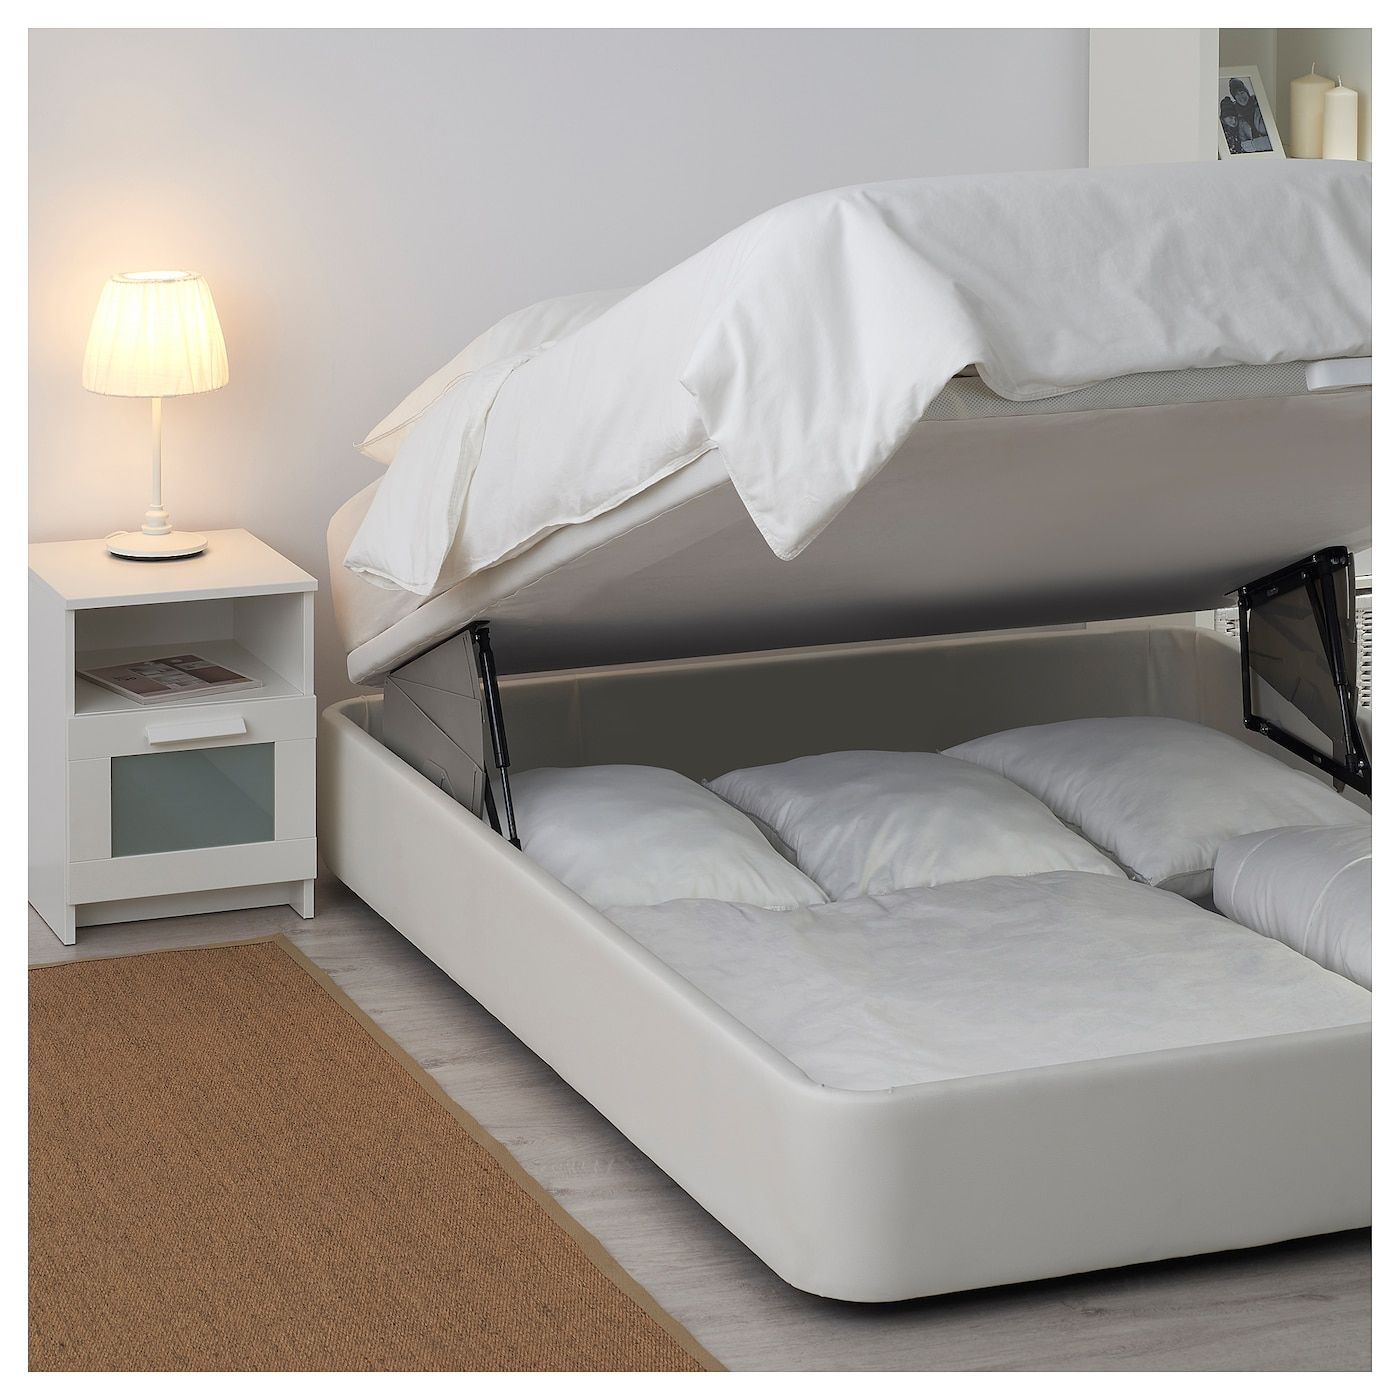 Kvitsoy Estrut Cama Acolchoada C Arrumacao Bomstad Branco 160x200 Cm Furniture Bed Ikea